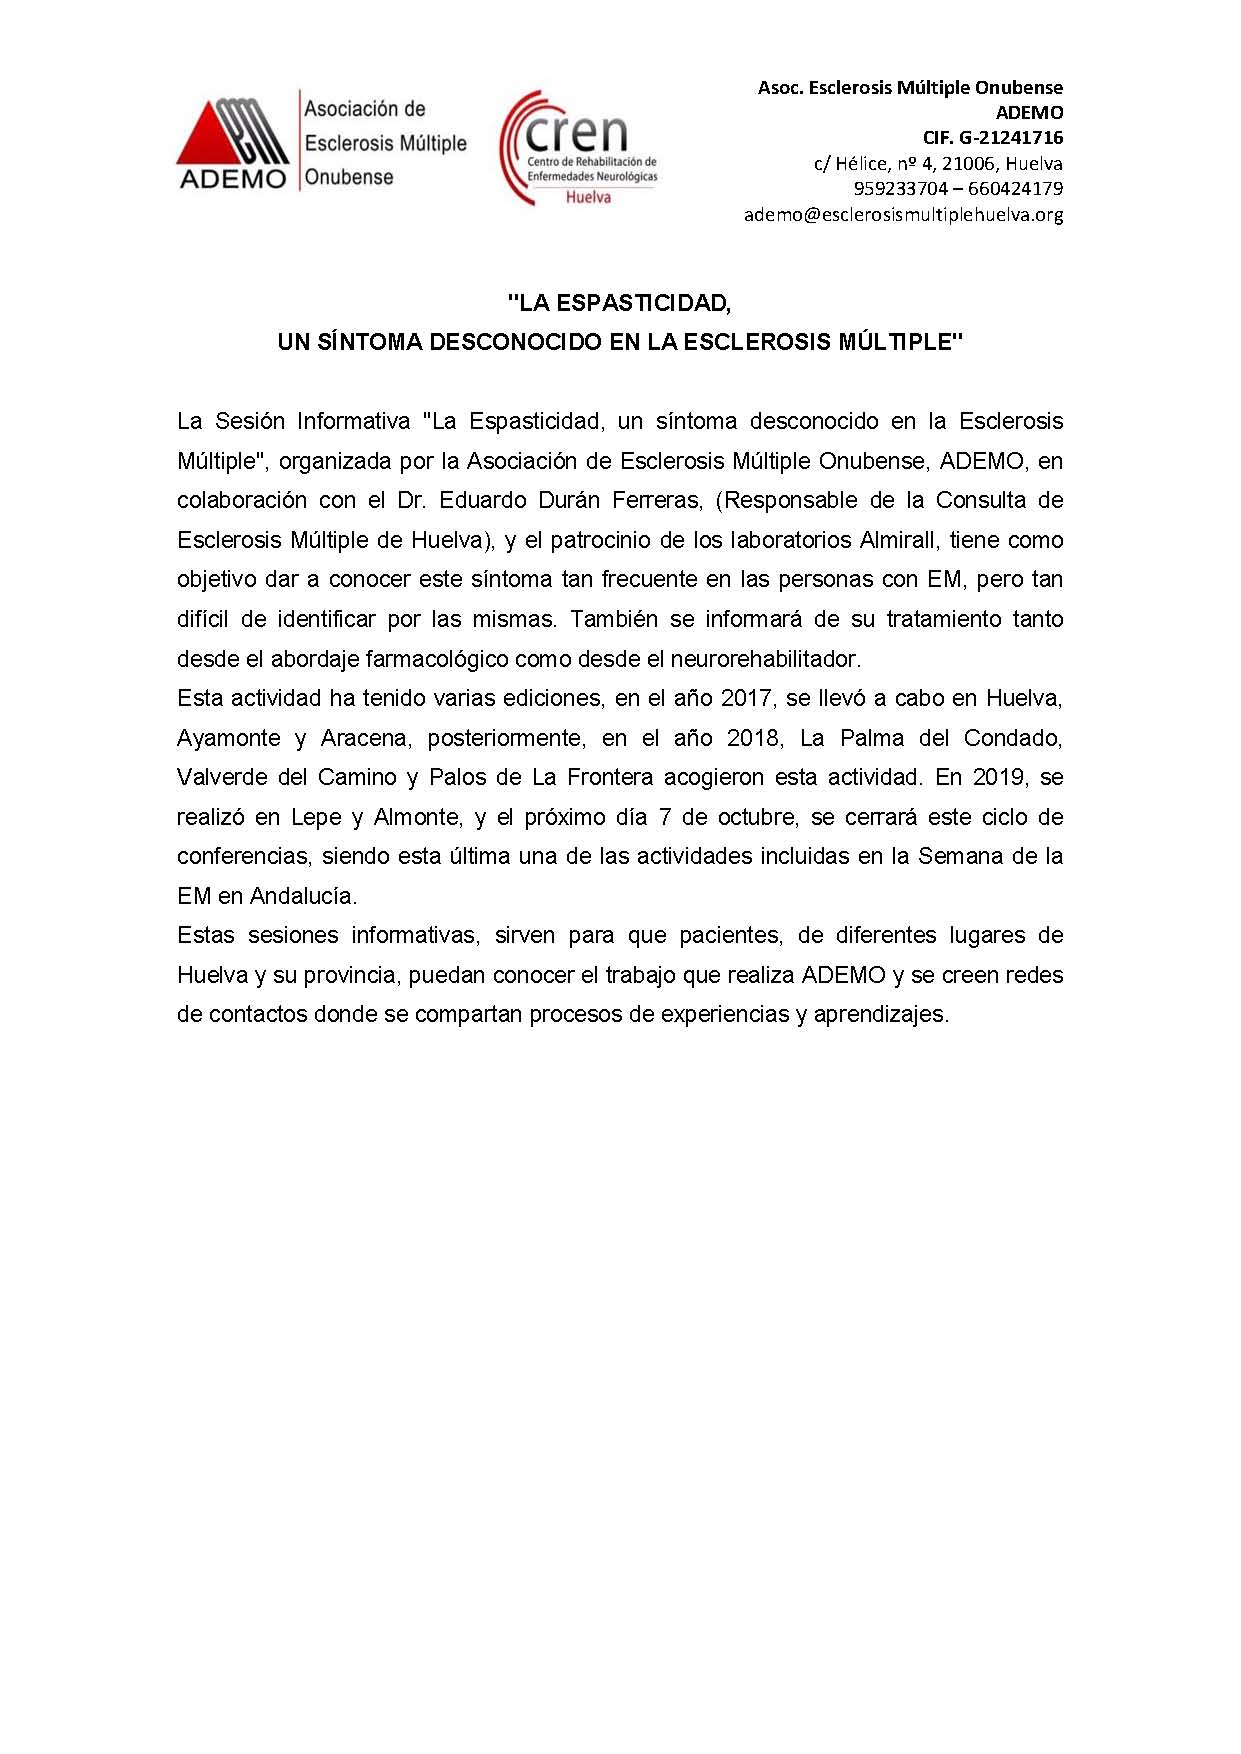 jornadas espasticidad-semana em 19_pagina_3.jpg